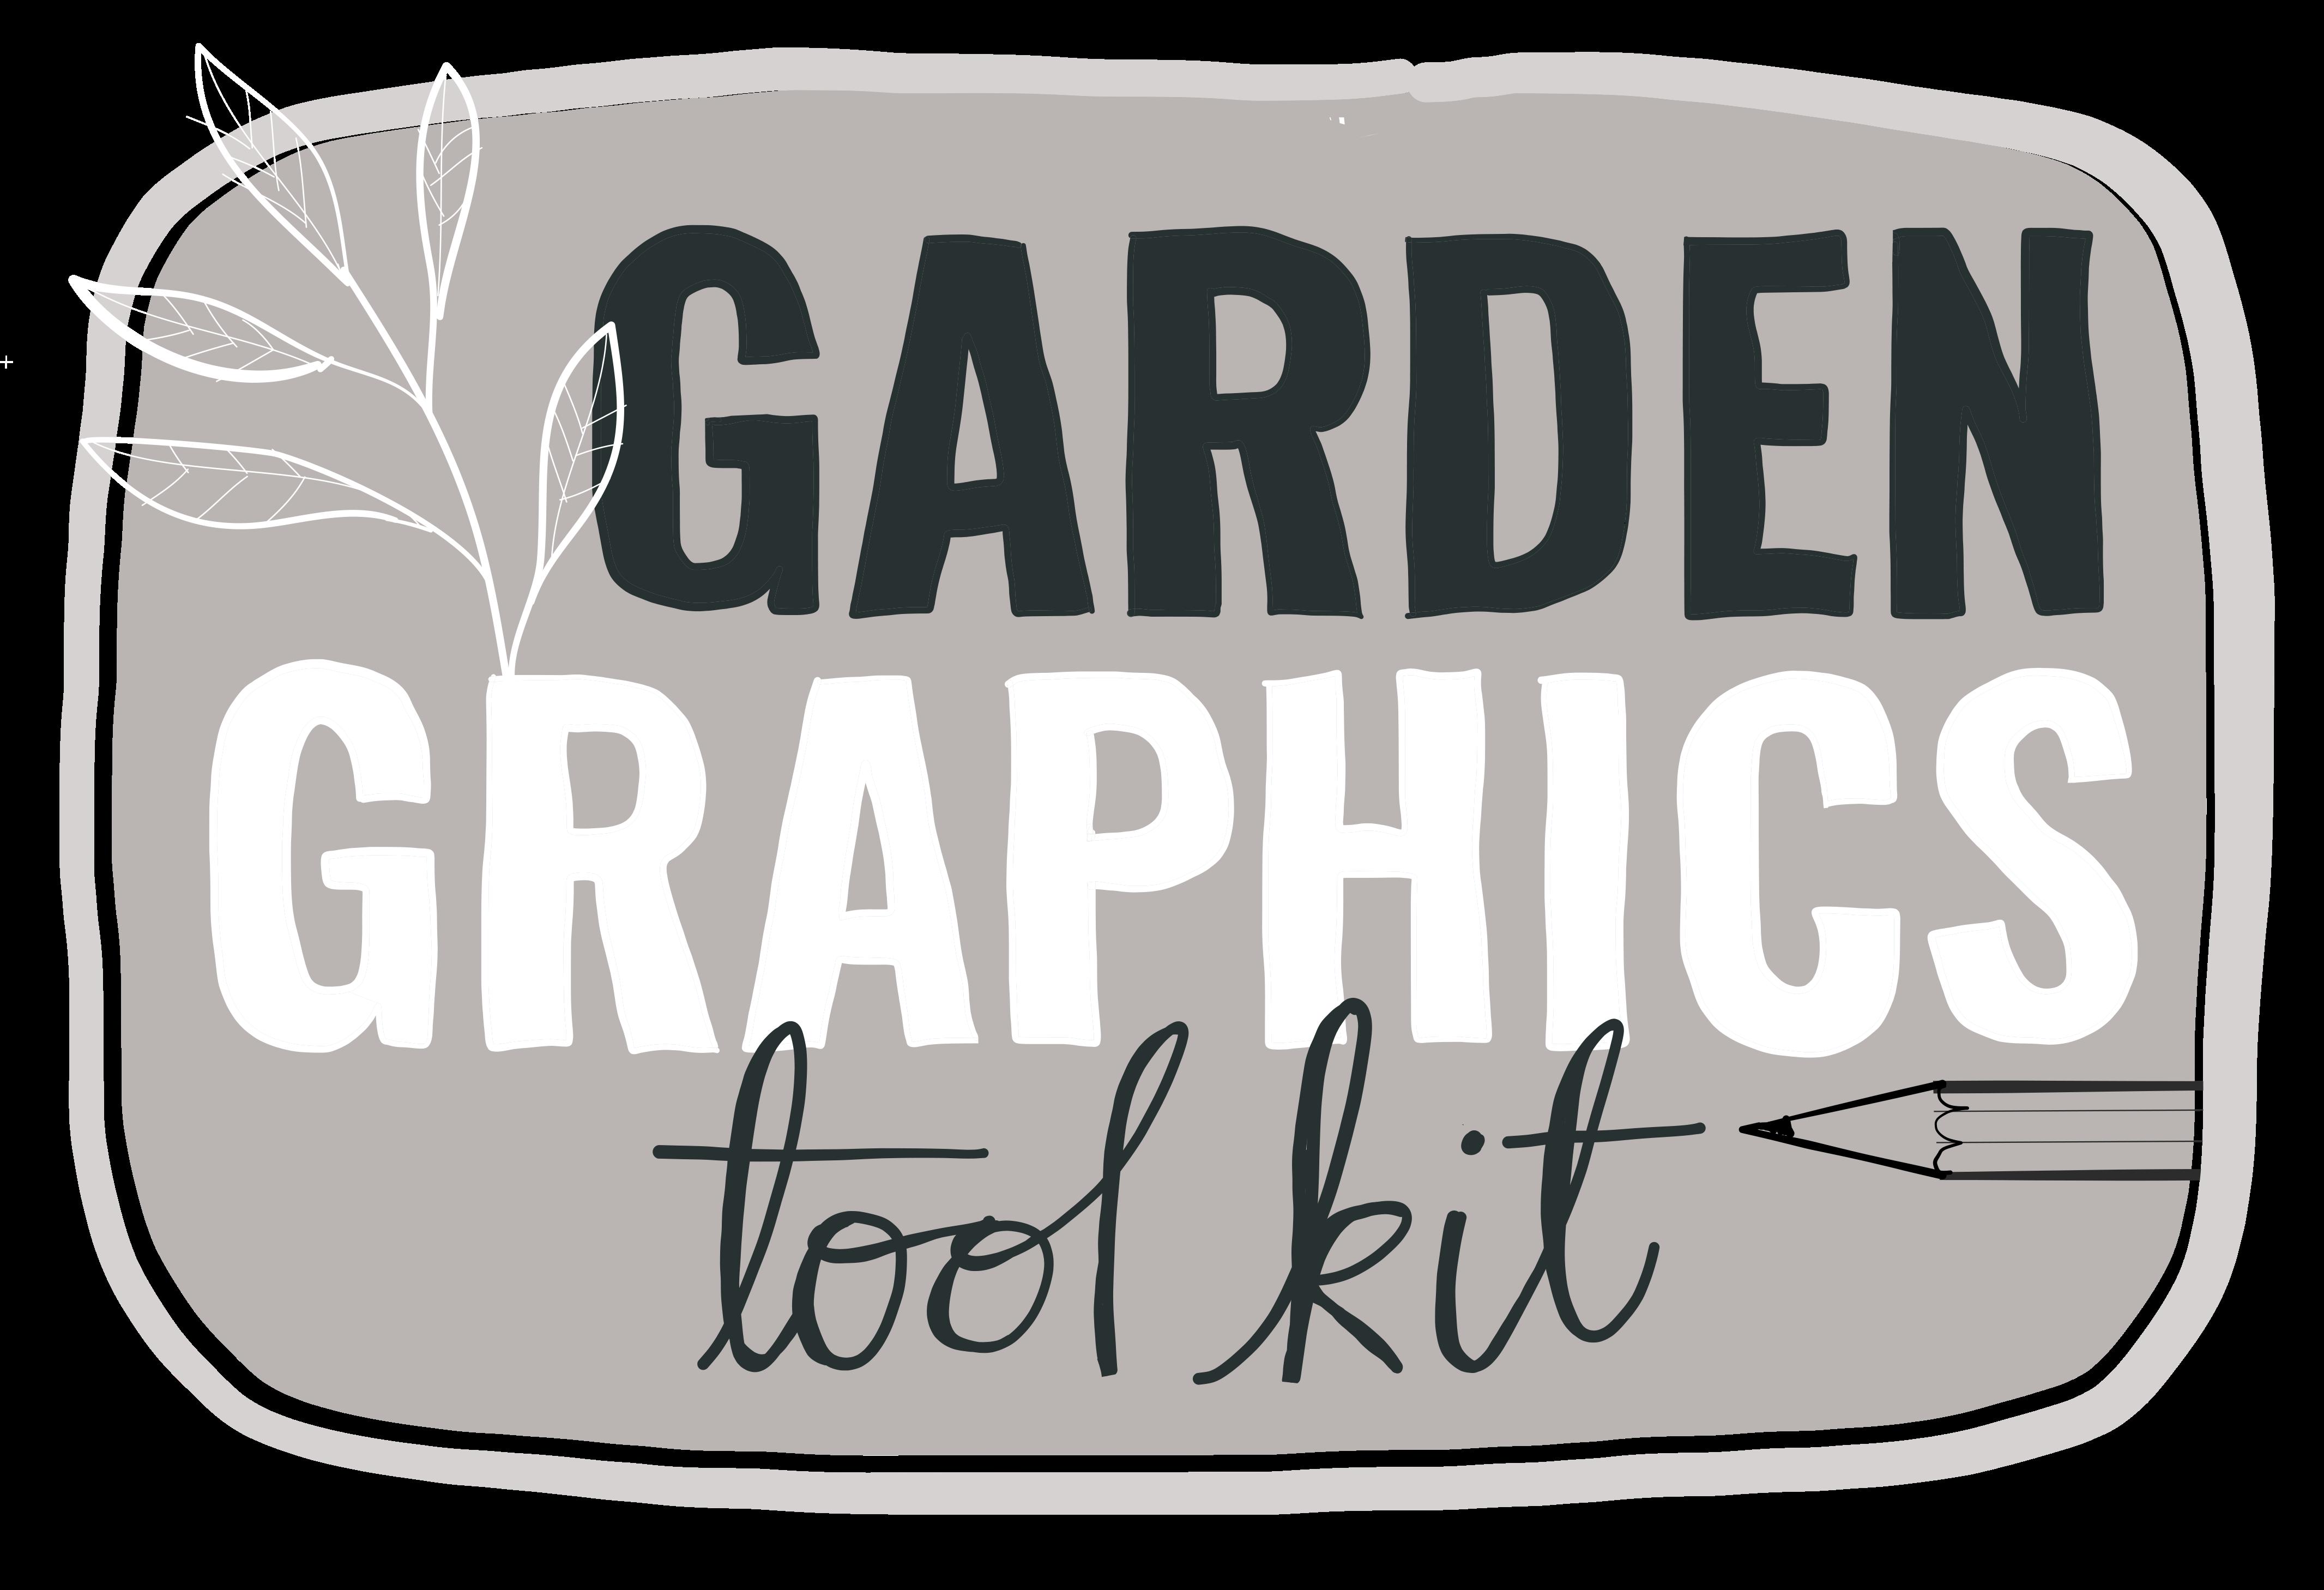 garden graphics tool kit logo